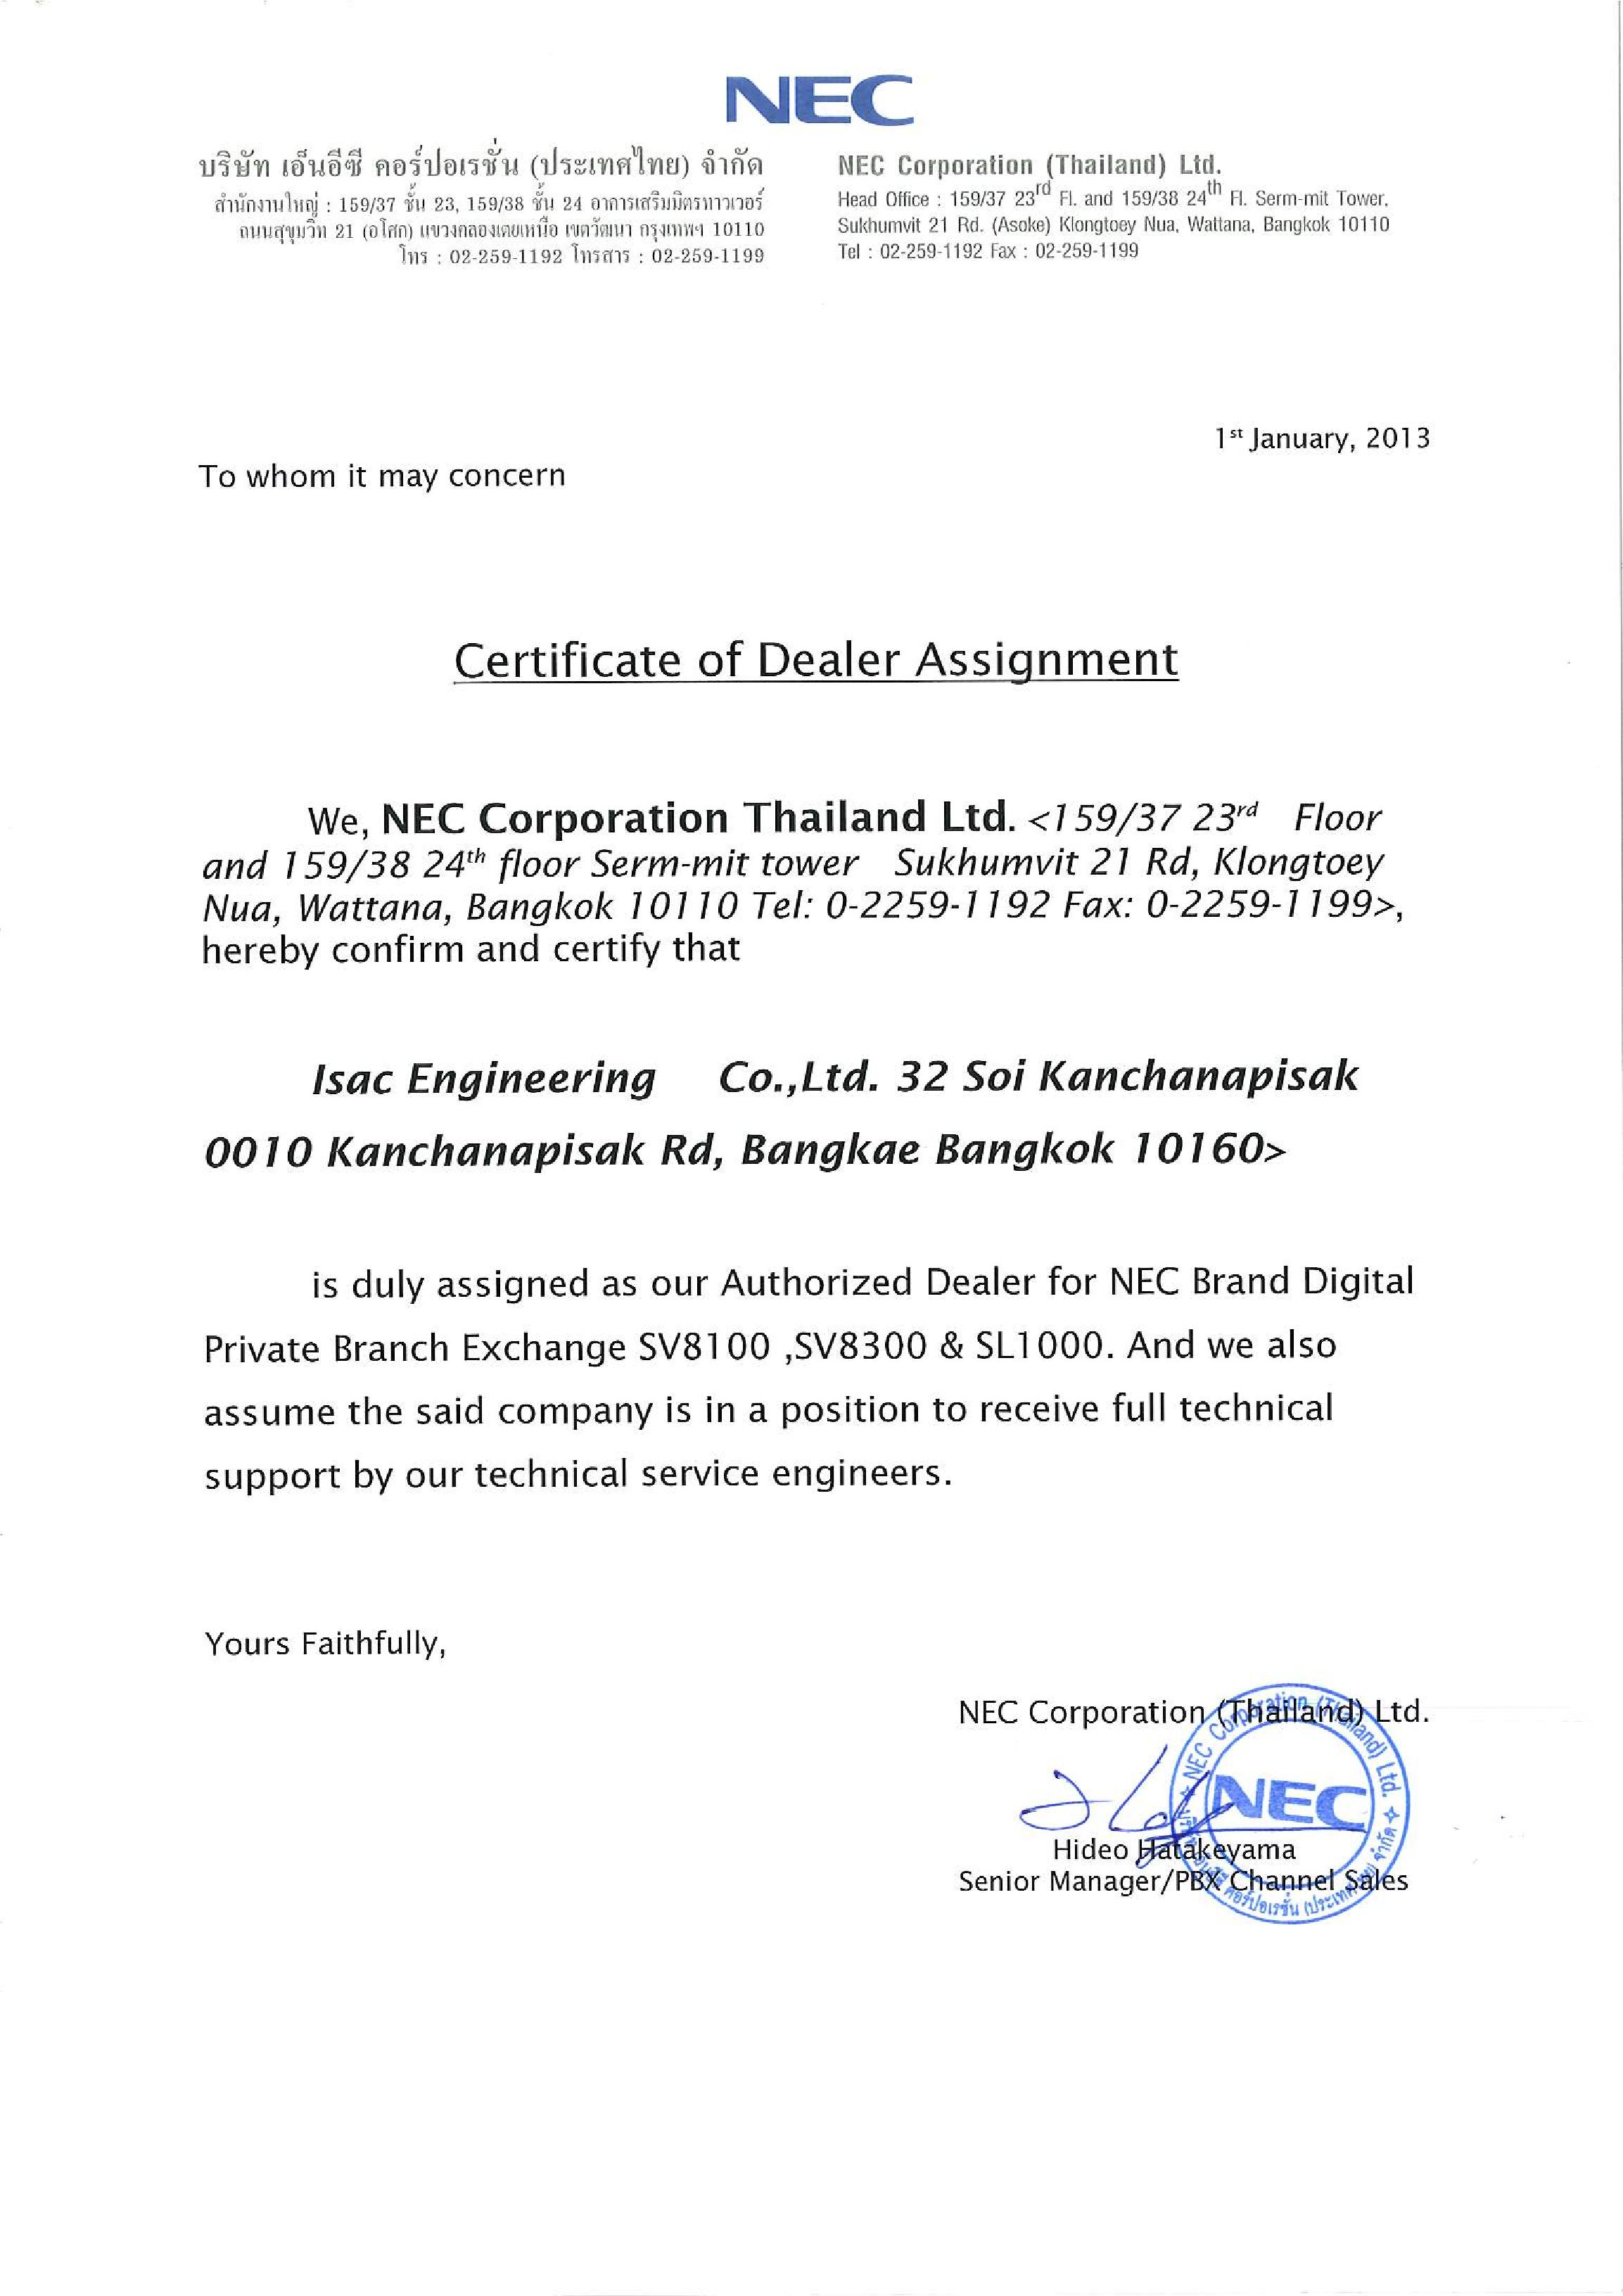 Dealer_NEC_Certificate_isacengineering_sl1000_sv8100_sv8300_2013